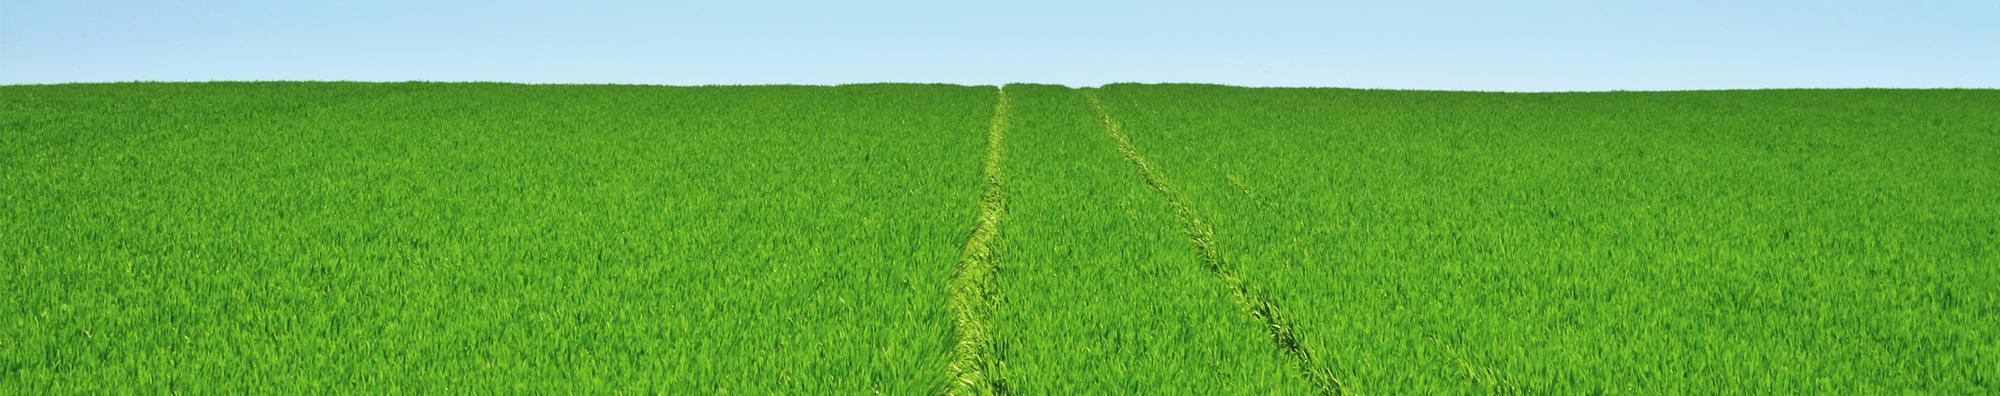 Grünes Feld mit Trekkerspur